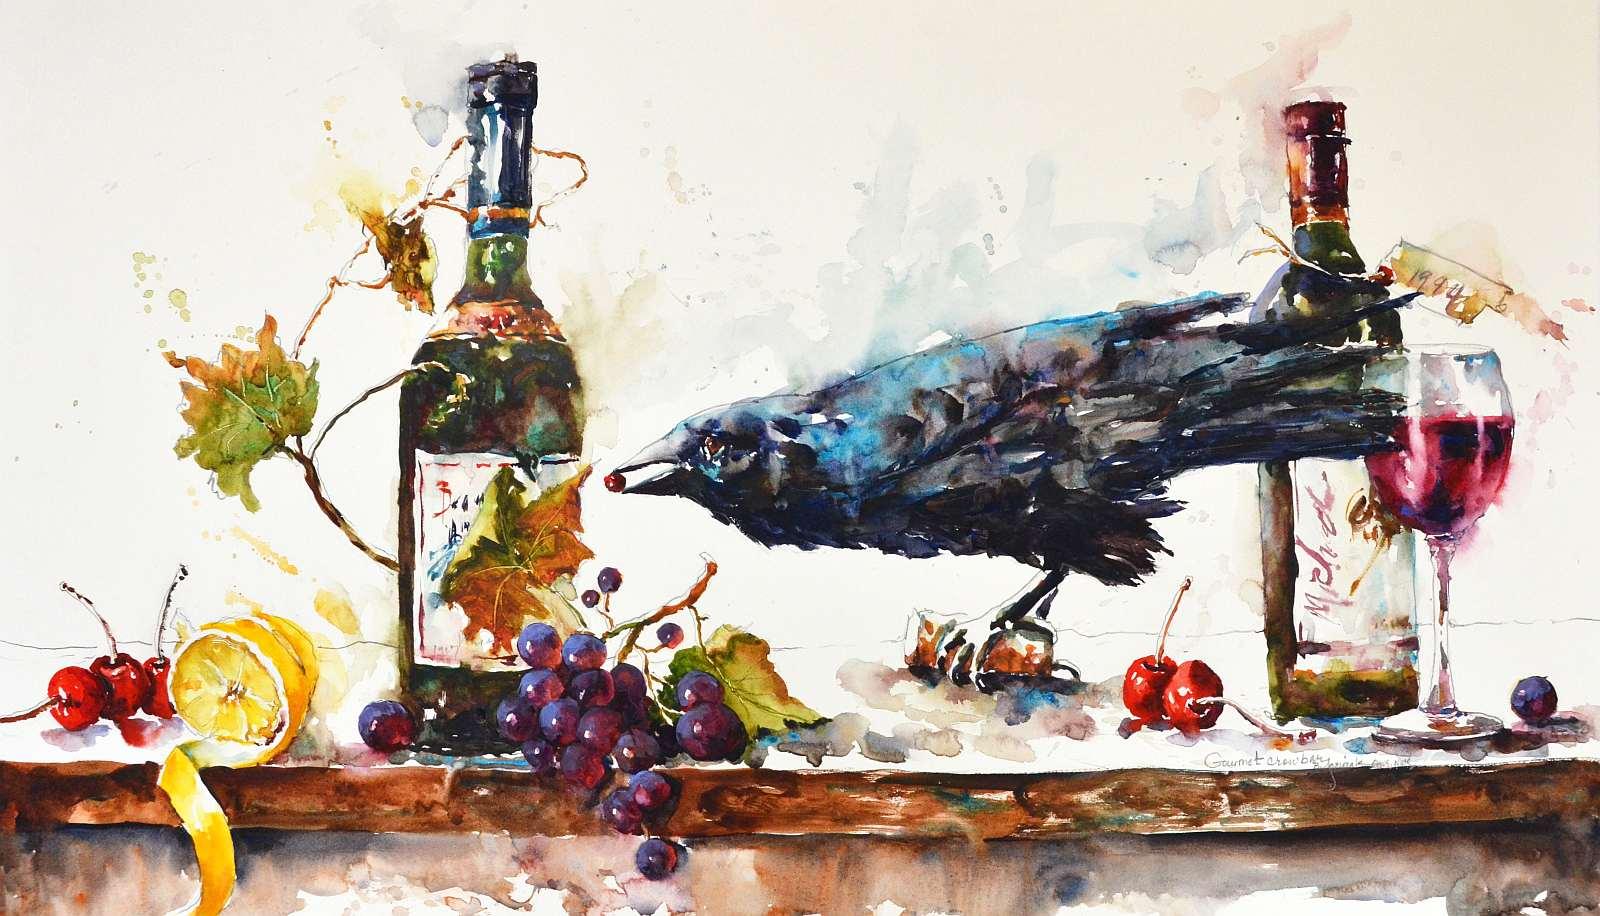 Gourmet Crow Bar 18x30 watercolor-